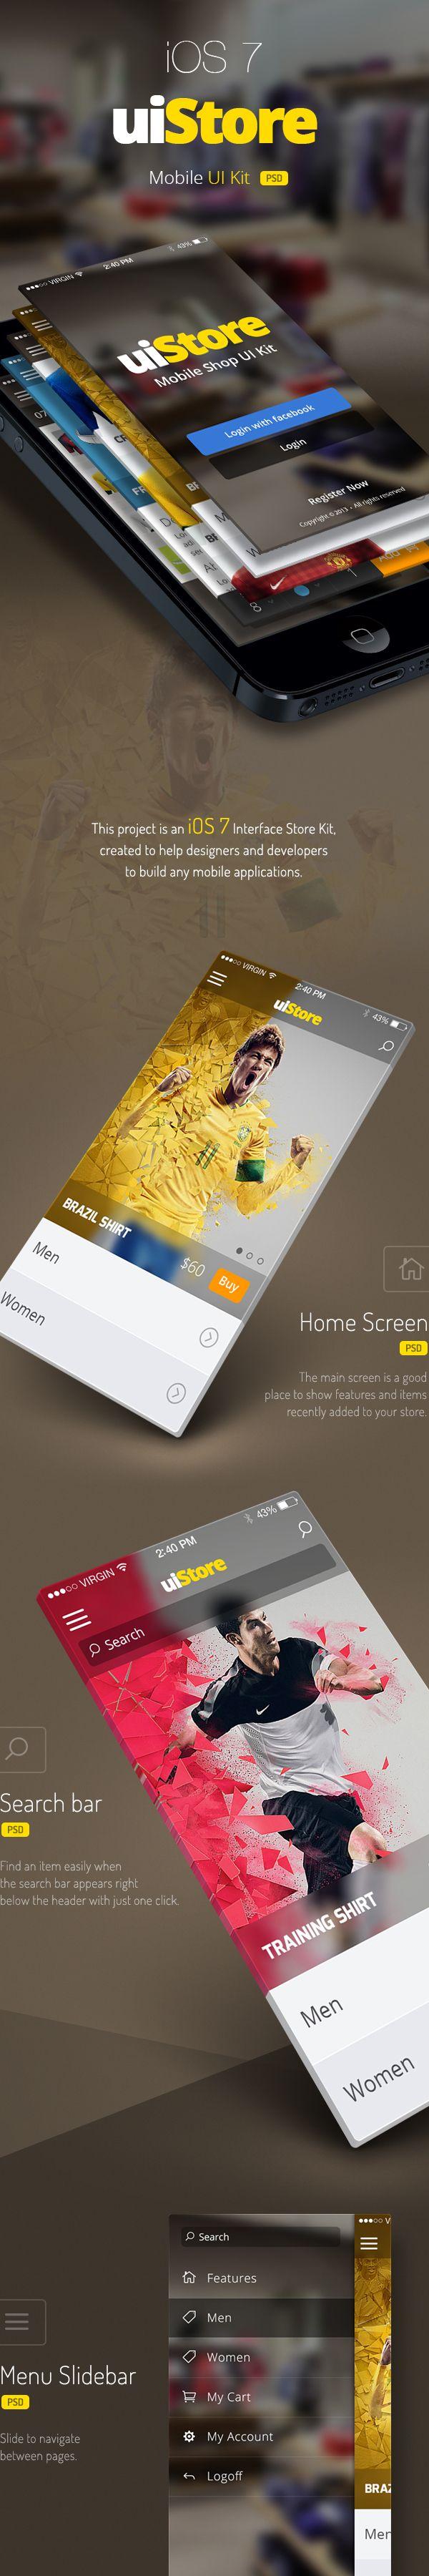 uiStore » iOS7 UI Kit by Rodrigo Santino, via Behance